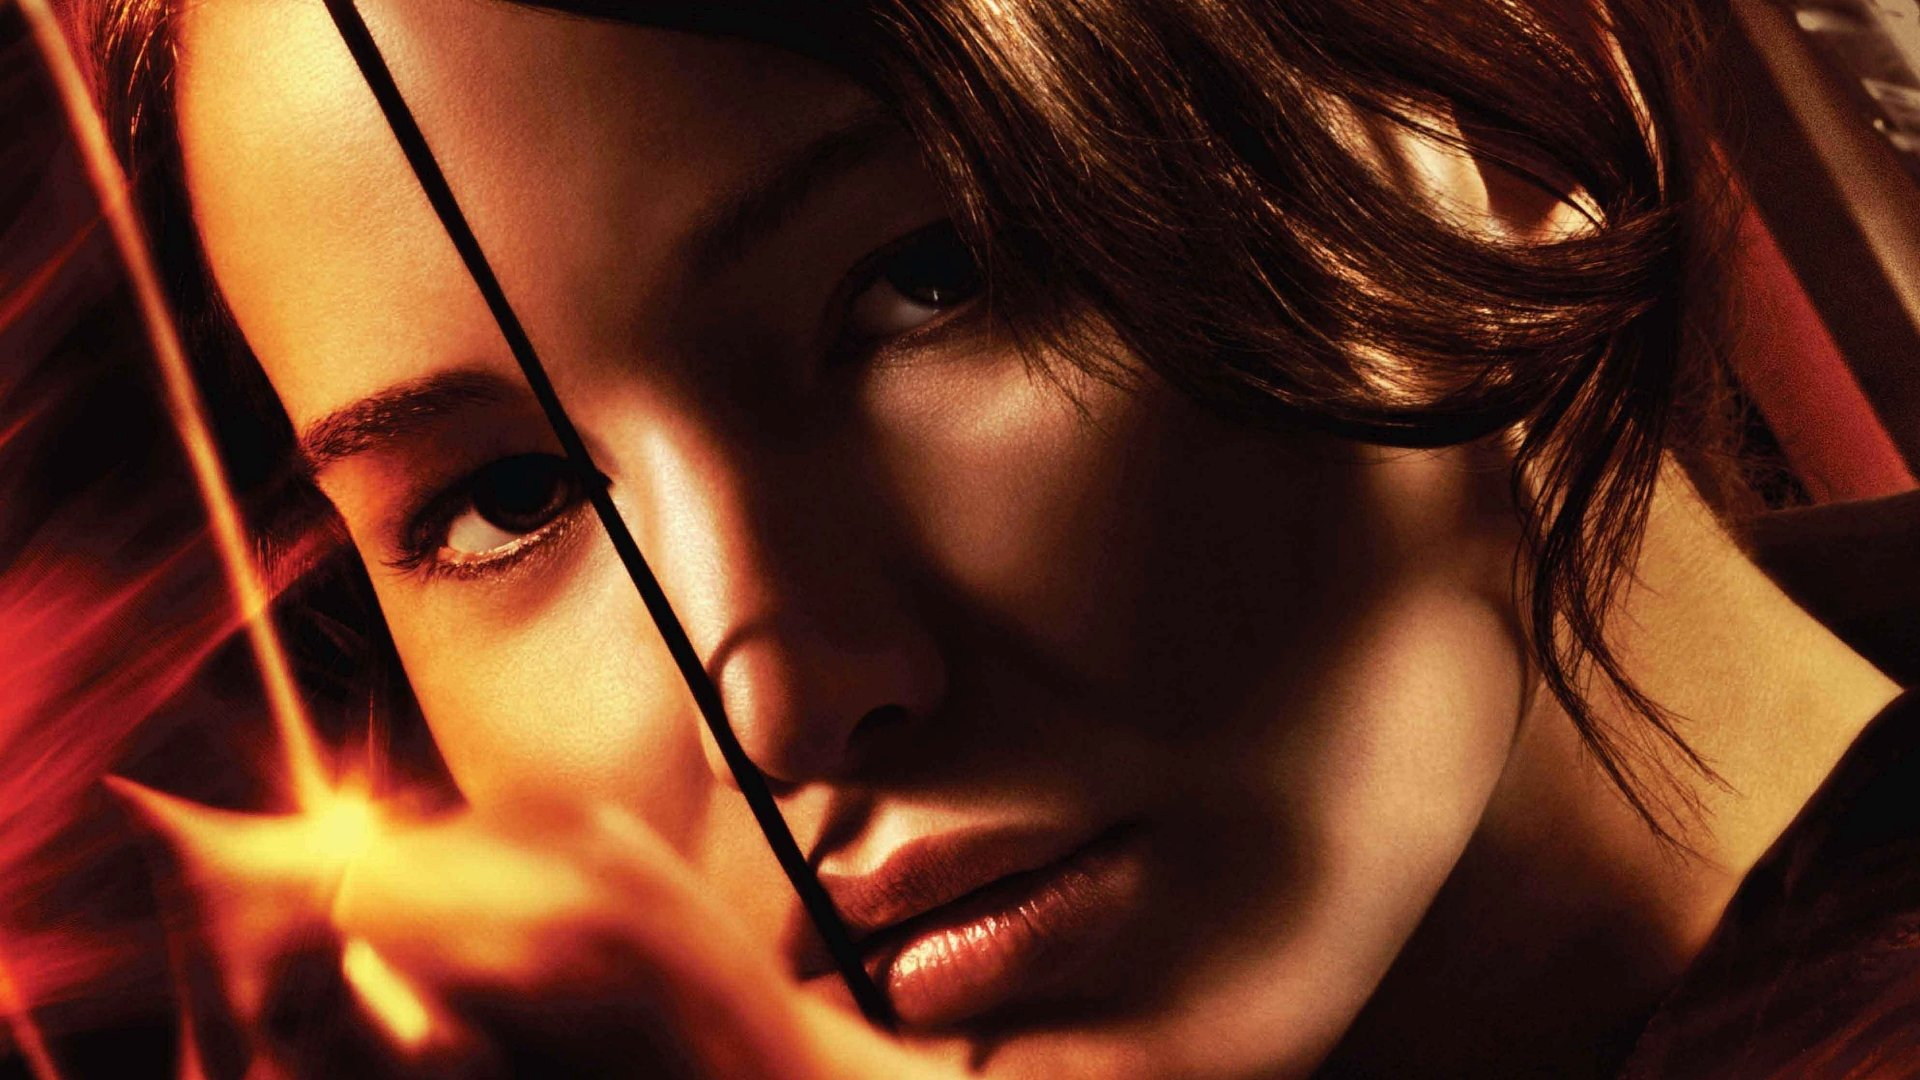 Movie - The Hunger Games  Jennifer Lawrence Katniss Everdeen Close-Up Wallpaper